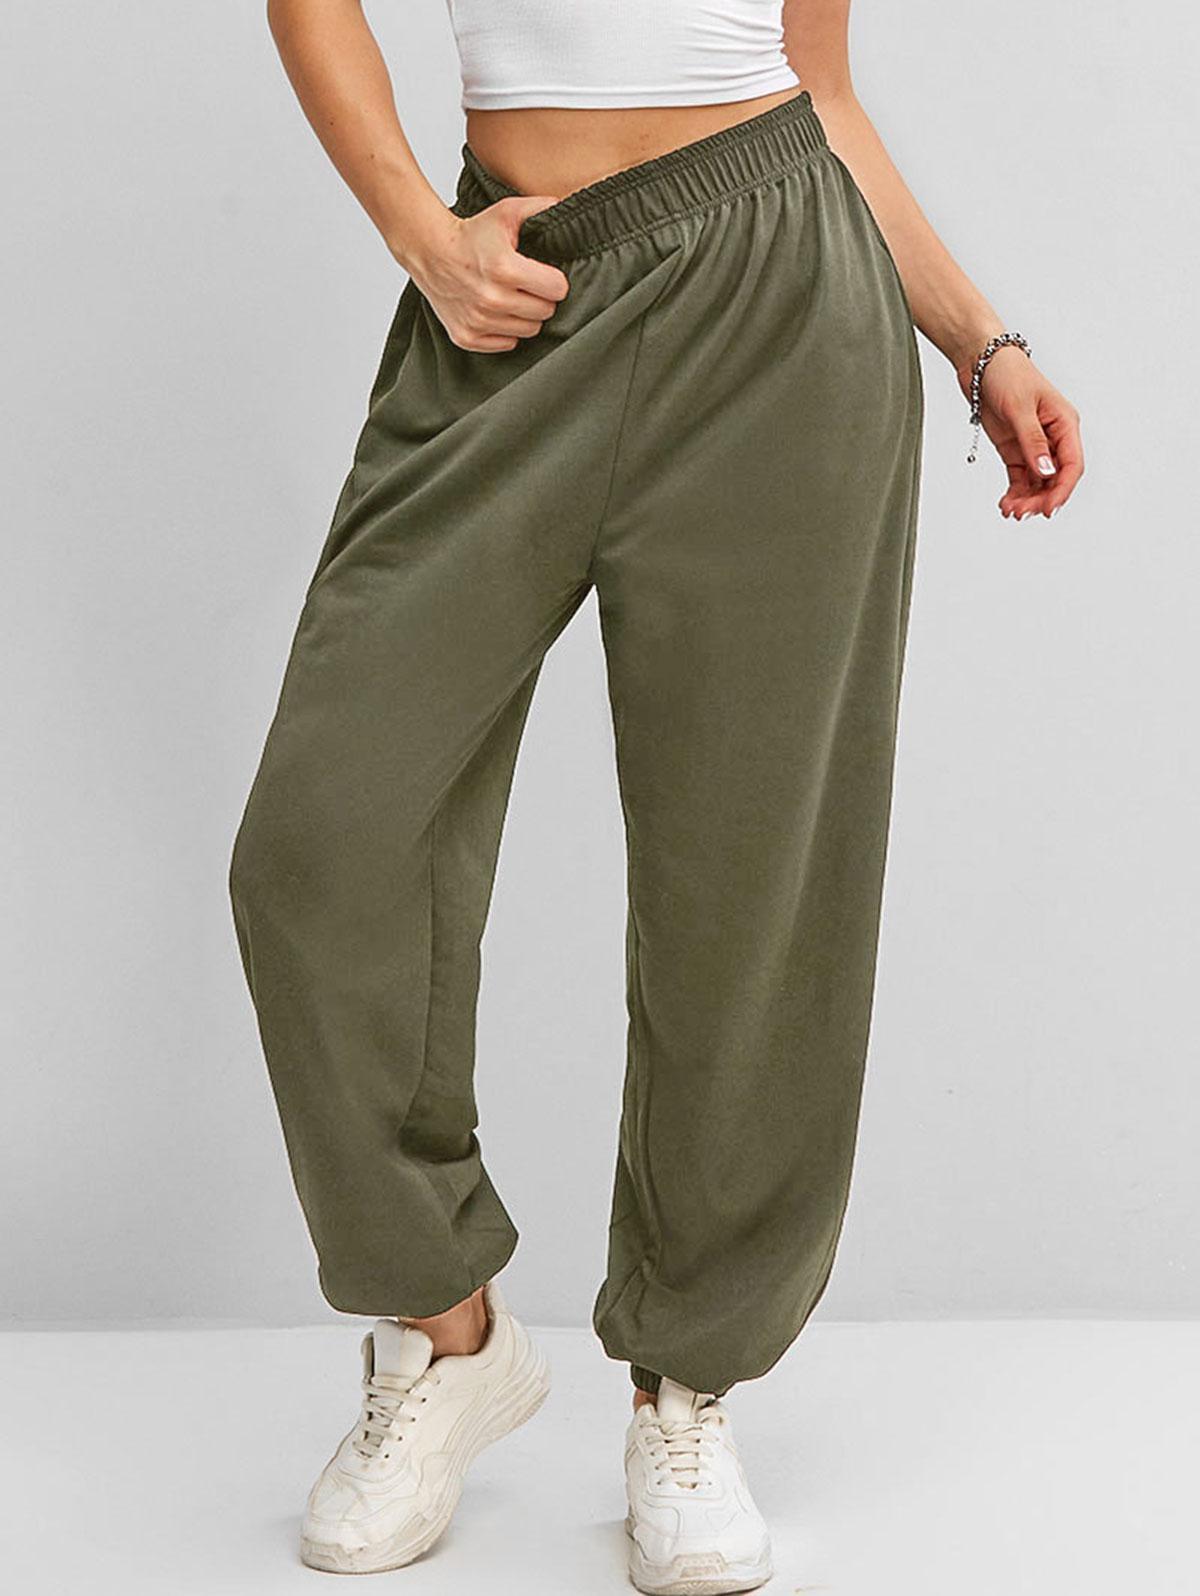 High Waisted Pocket Jogger Sweatpants